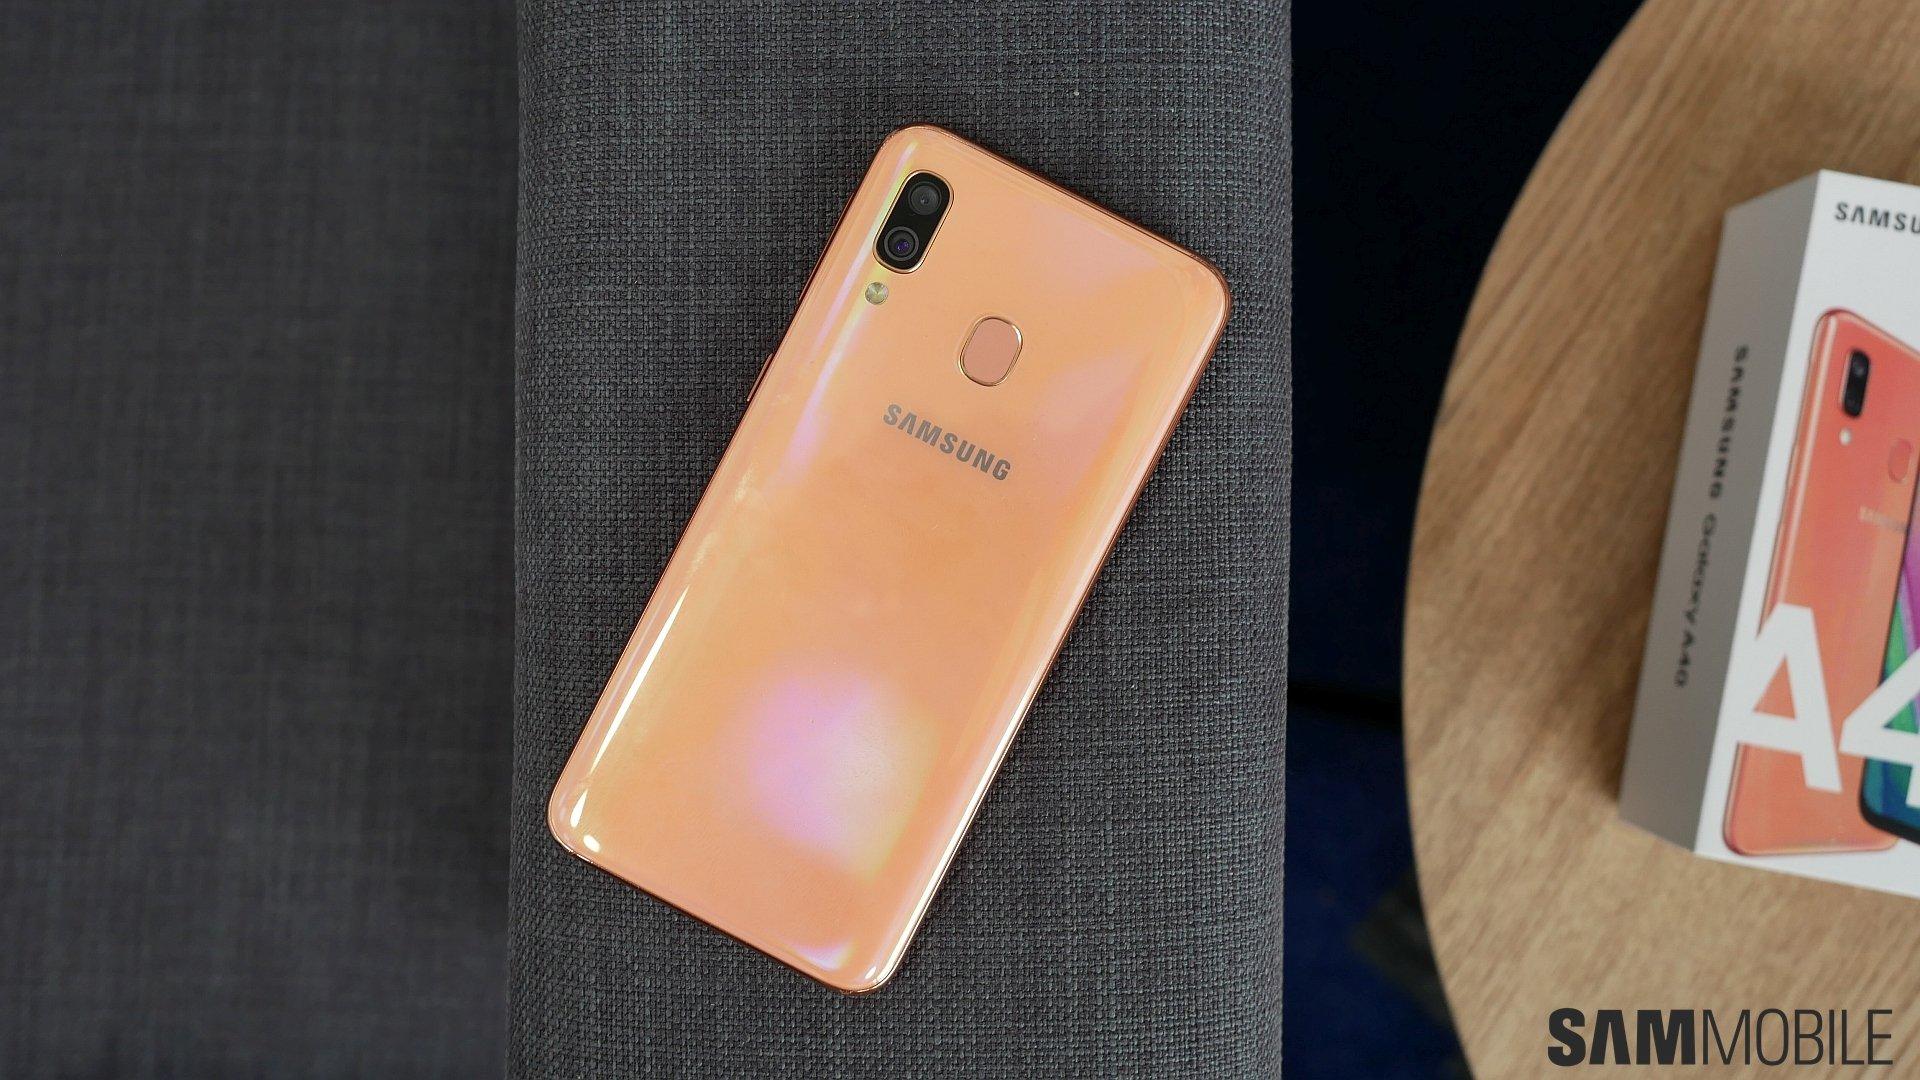 Samsung Galaxy A40 review: A compact no-frills mid-range smartphone